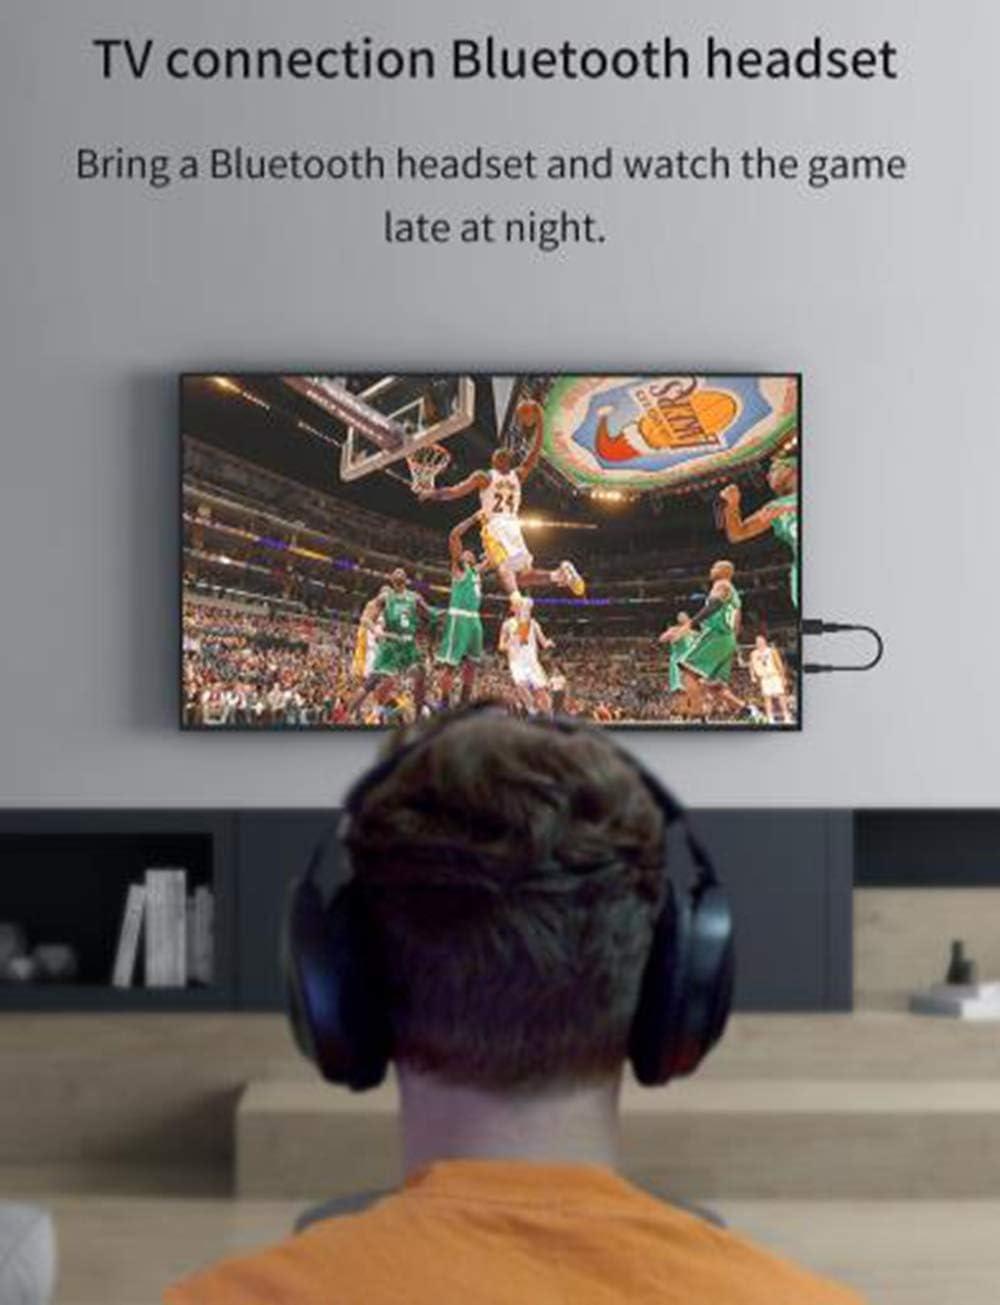 Goldoars Adaptador Bluetooth Transmisor USB 5.0 Receptor con l/ínea de Audio de 3.5 mm PC Adaptador inal/ámbrico de transmisor Bluetooth para TV Auriculares Sistemas de Sonido para autom/óviles